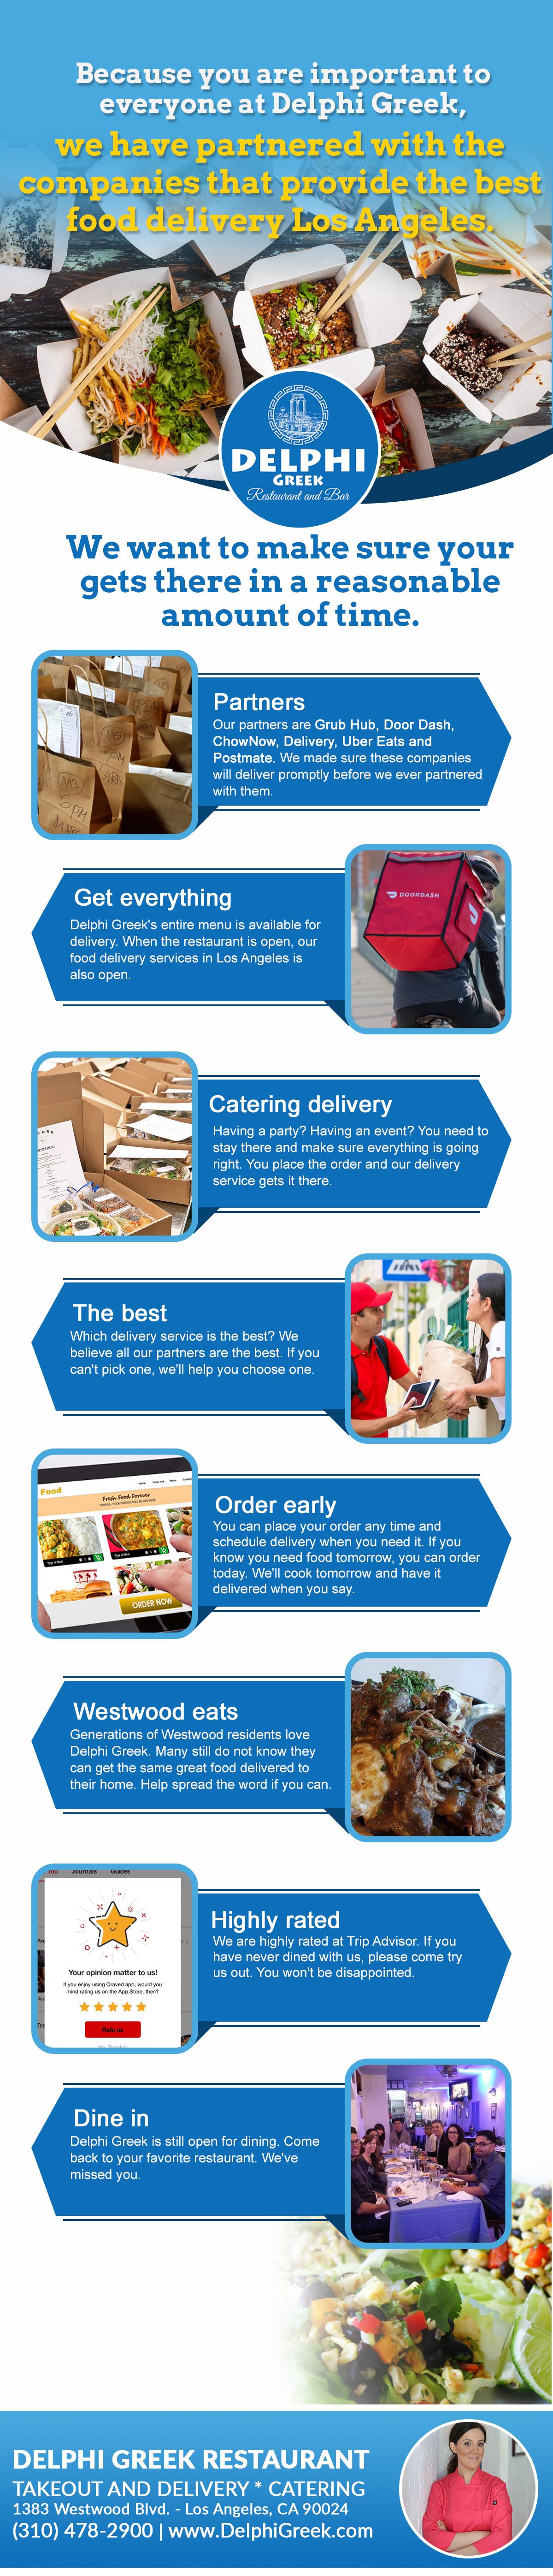 food delivery los angeles_6-2021